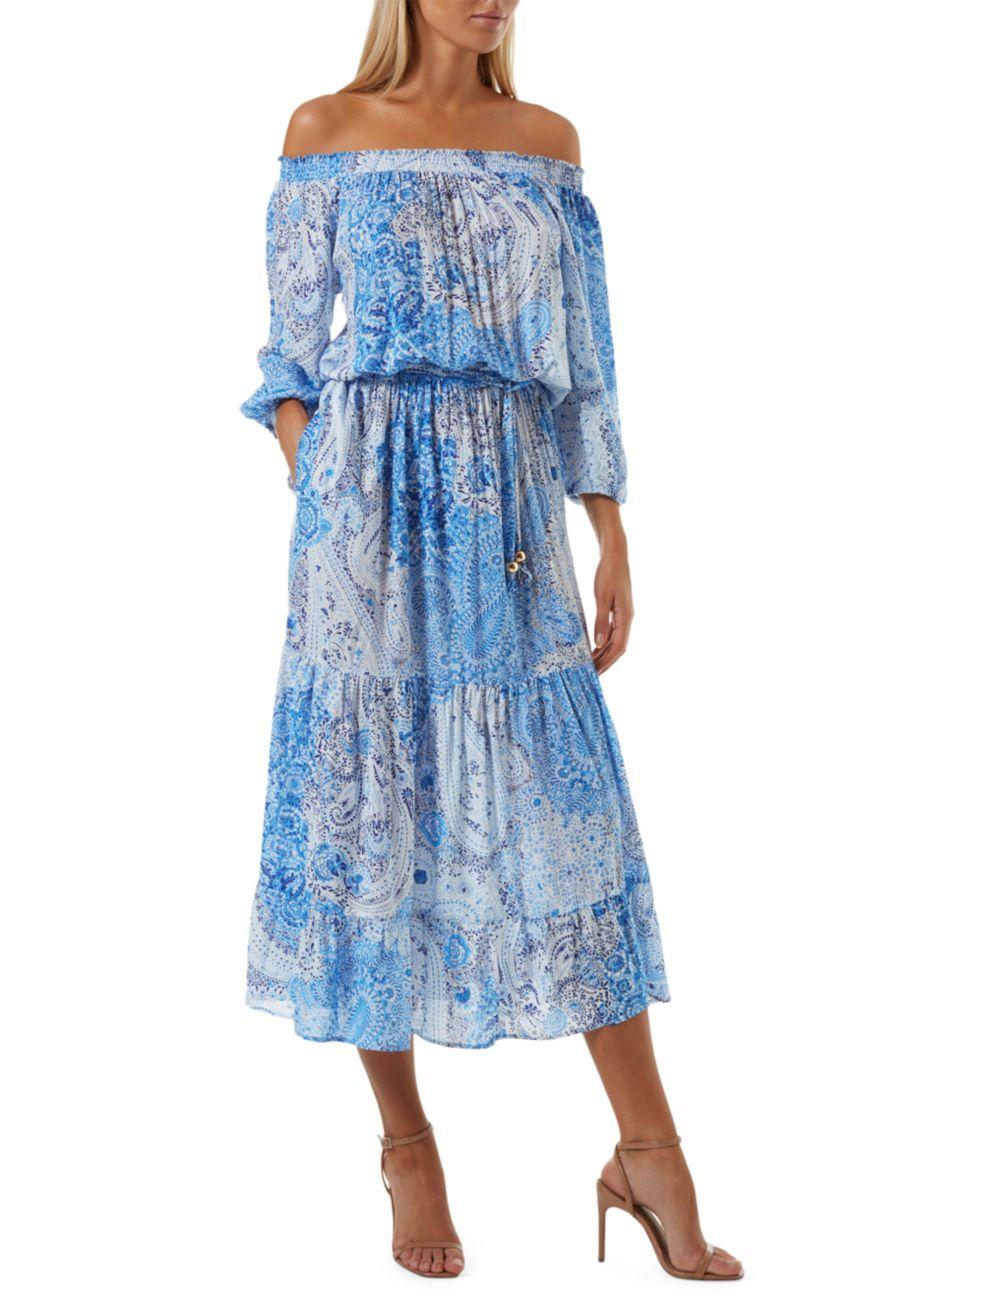 Melissa Odabash Condor Paisley Off-the-Shoulder Dress | SaksFifthAvenue